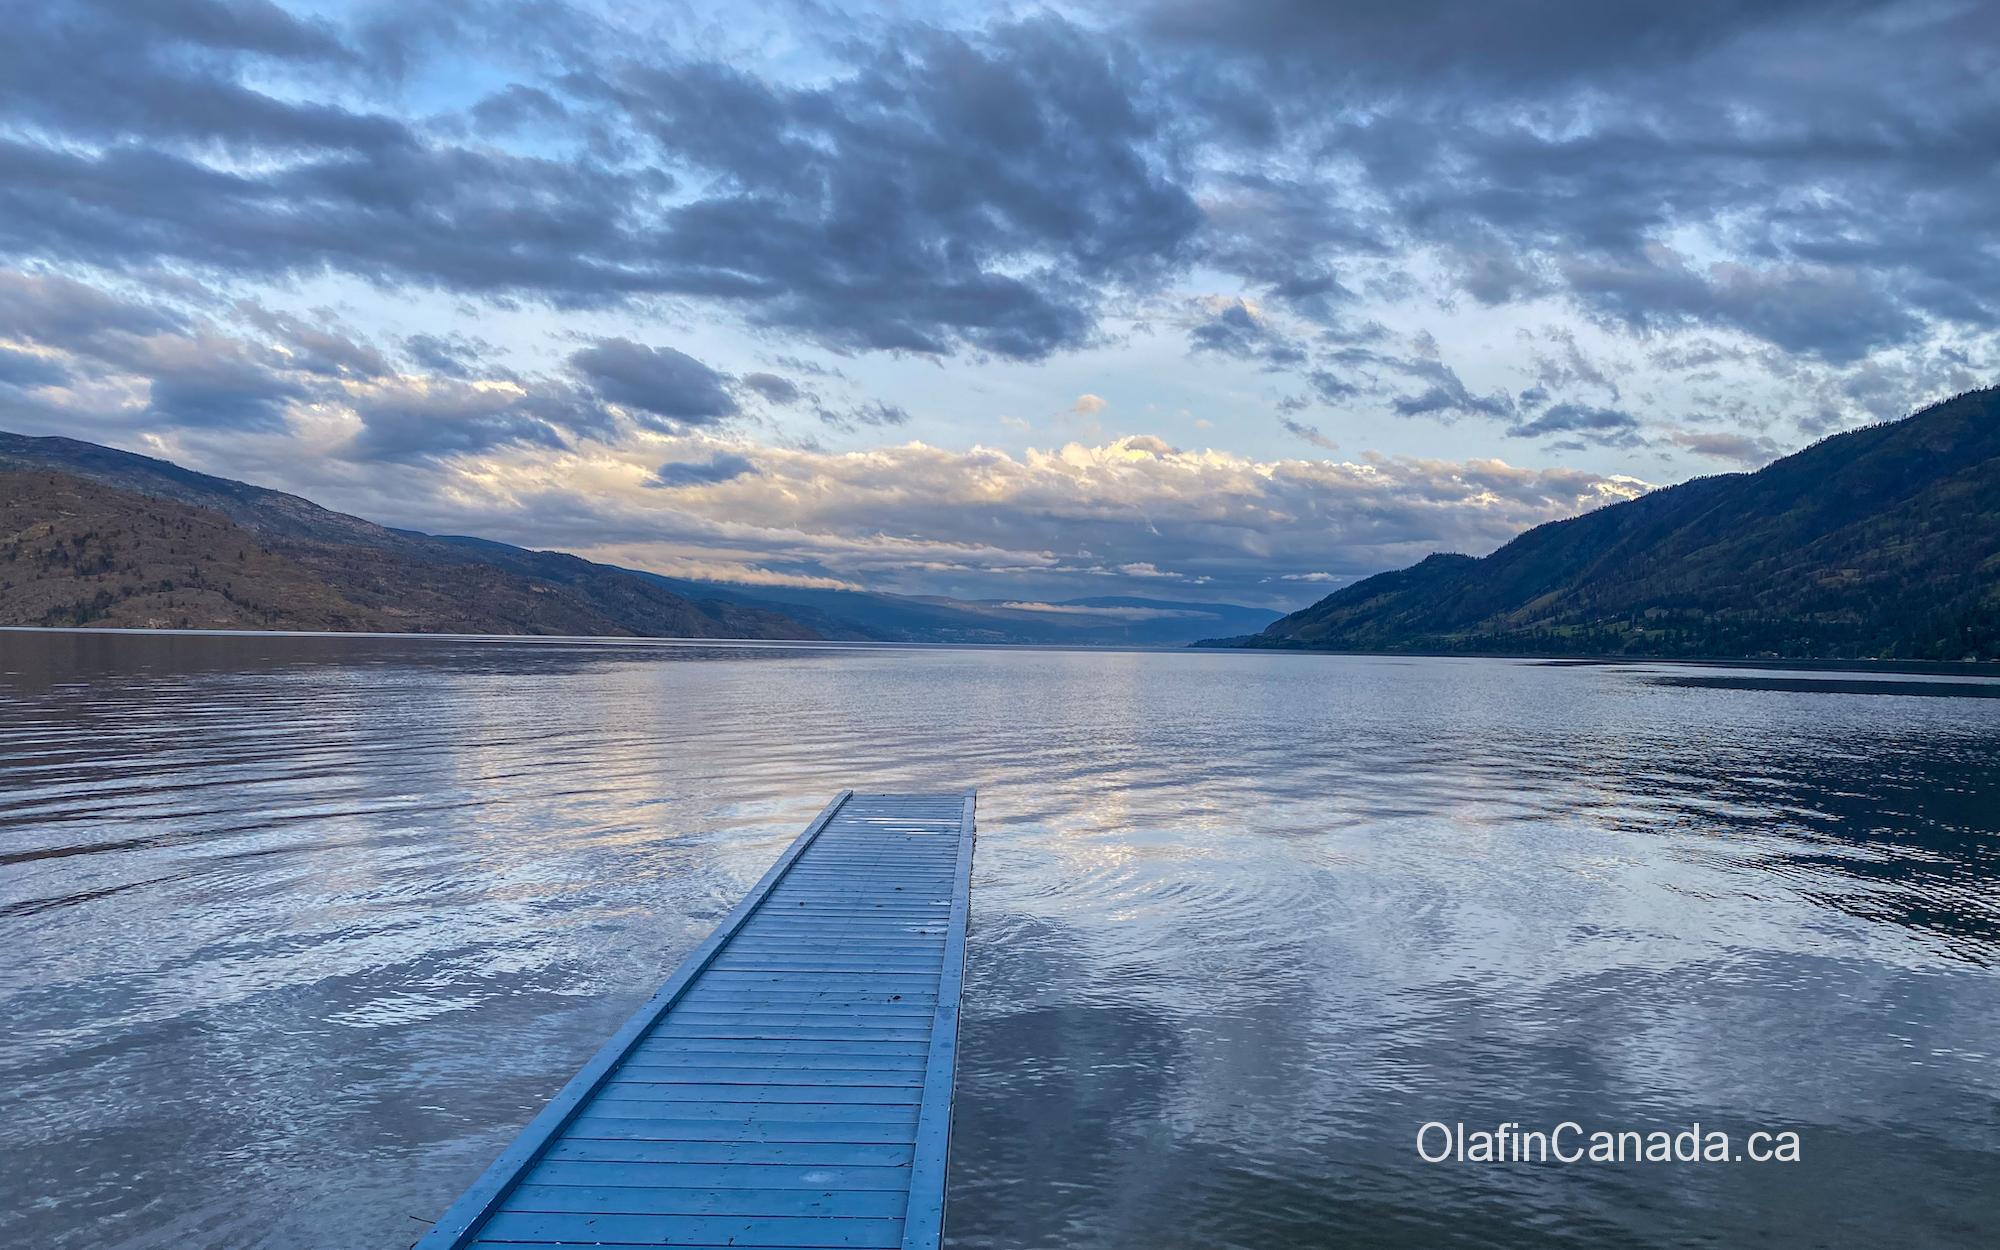 Blue floating dock in Okanagan Lake #olafincanada #britishcolumbia #discoverbc #okanaganlake #peachland